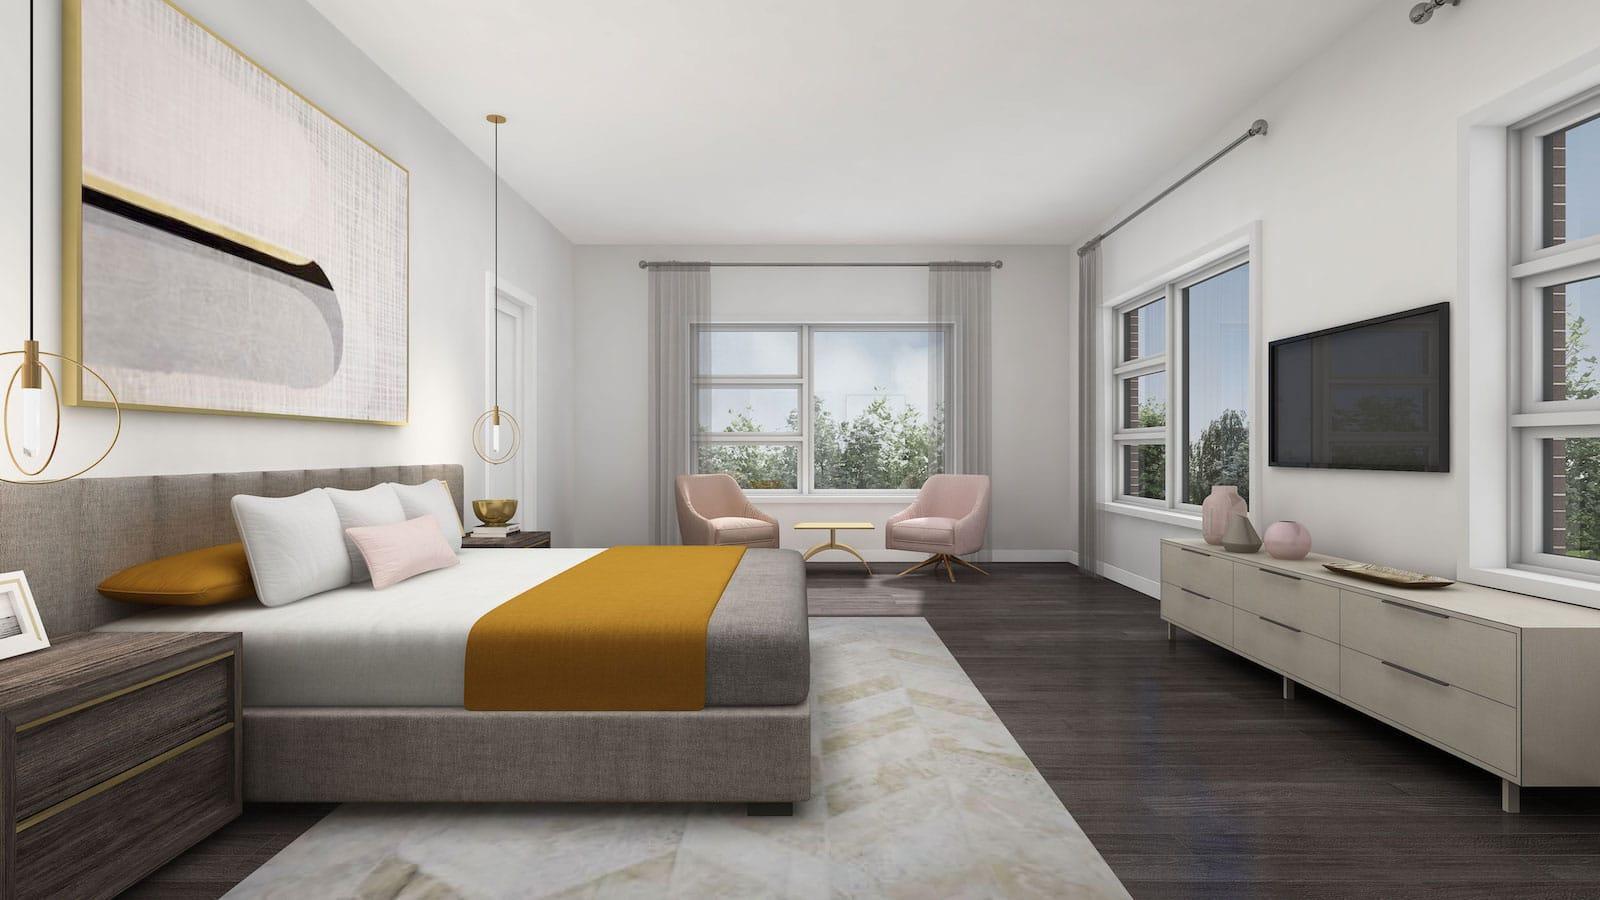 NuTowns Interior Rendering of Bedroom